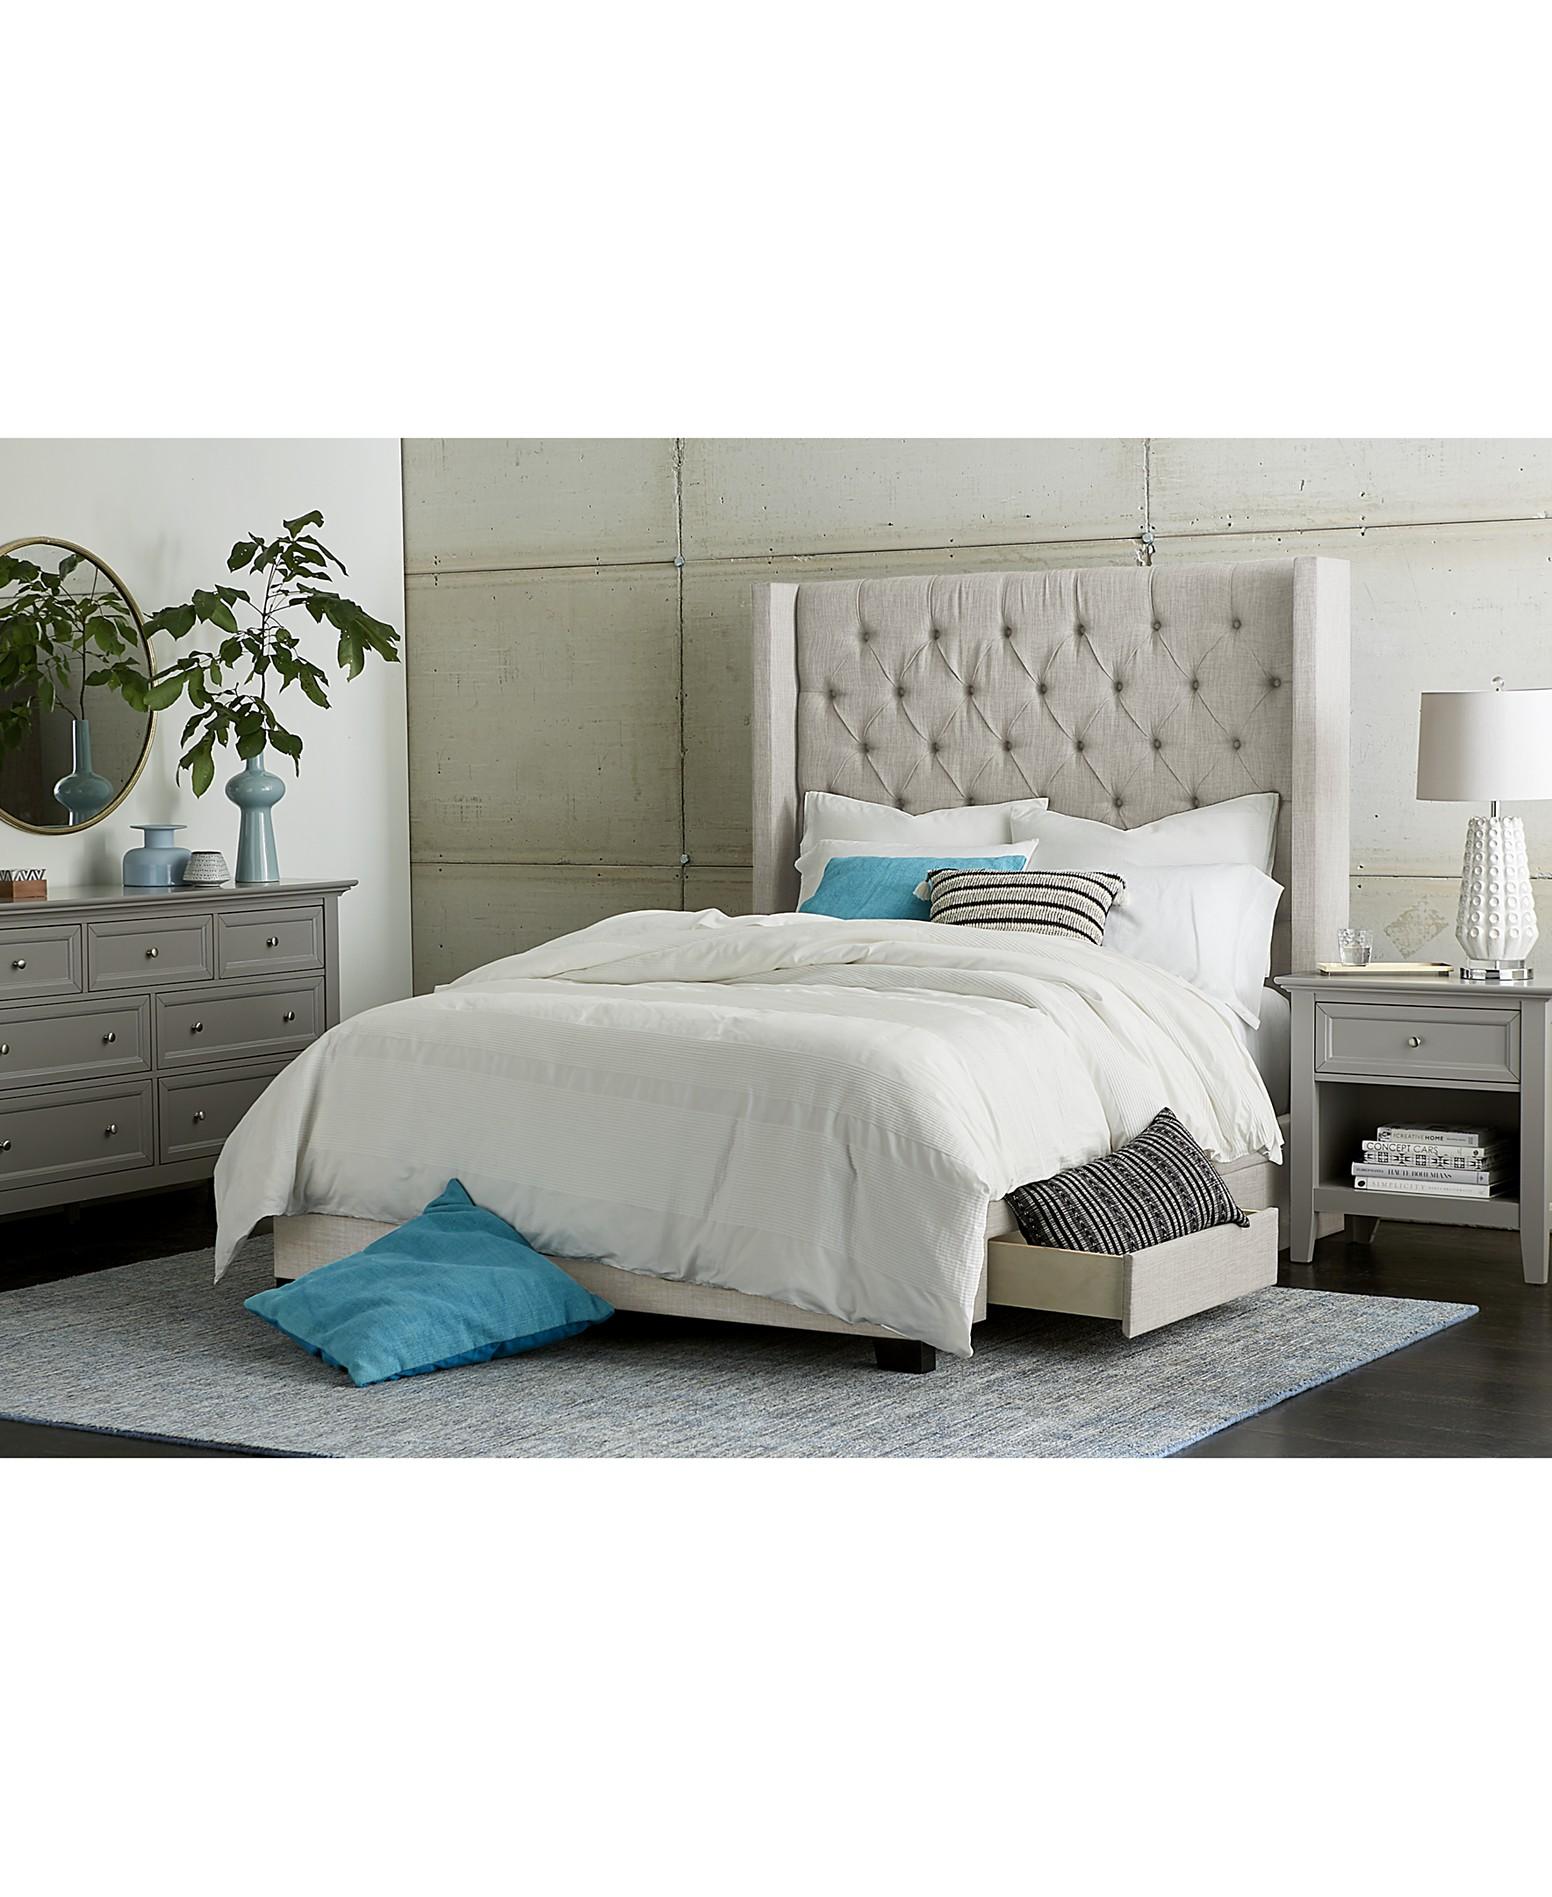 Furniture Monroe Storage Bedroom Furniture Collection ...